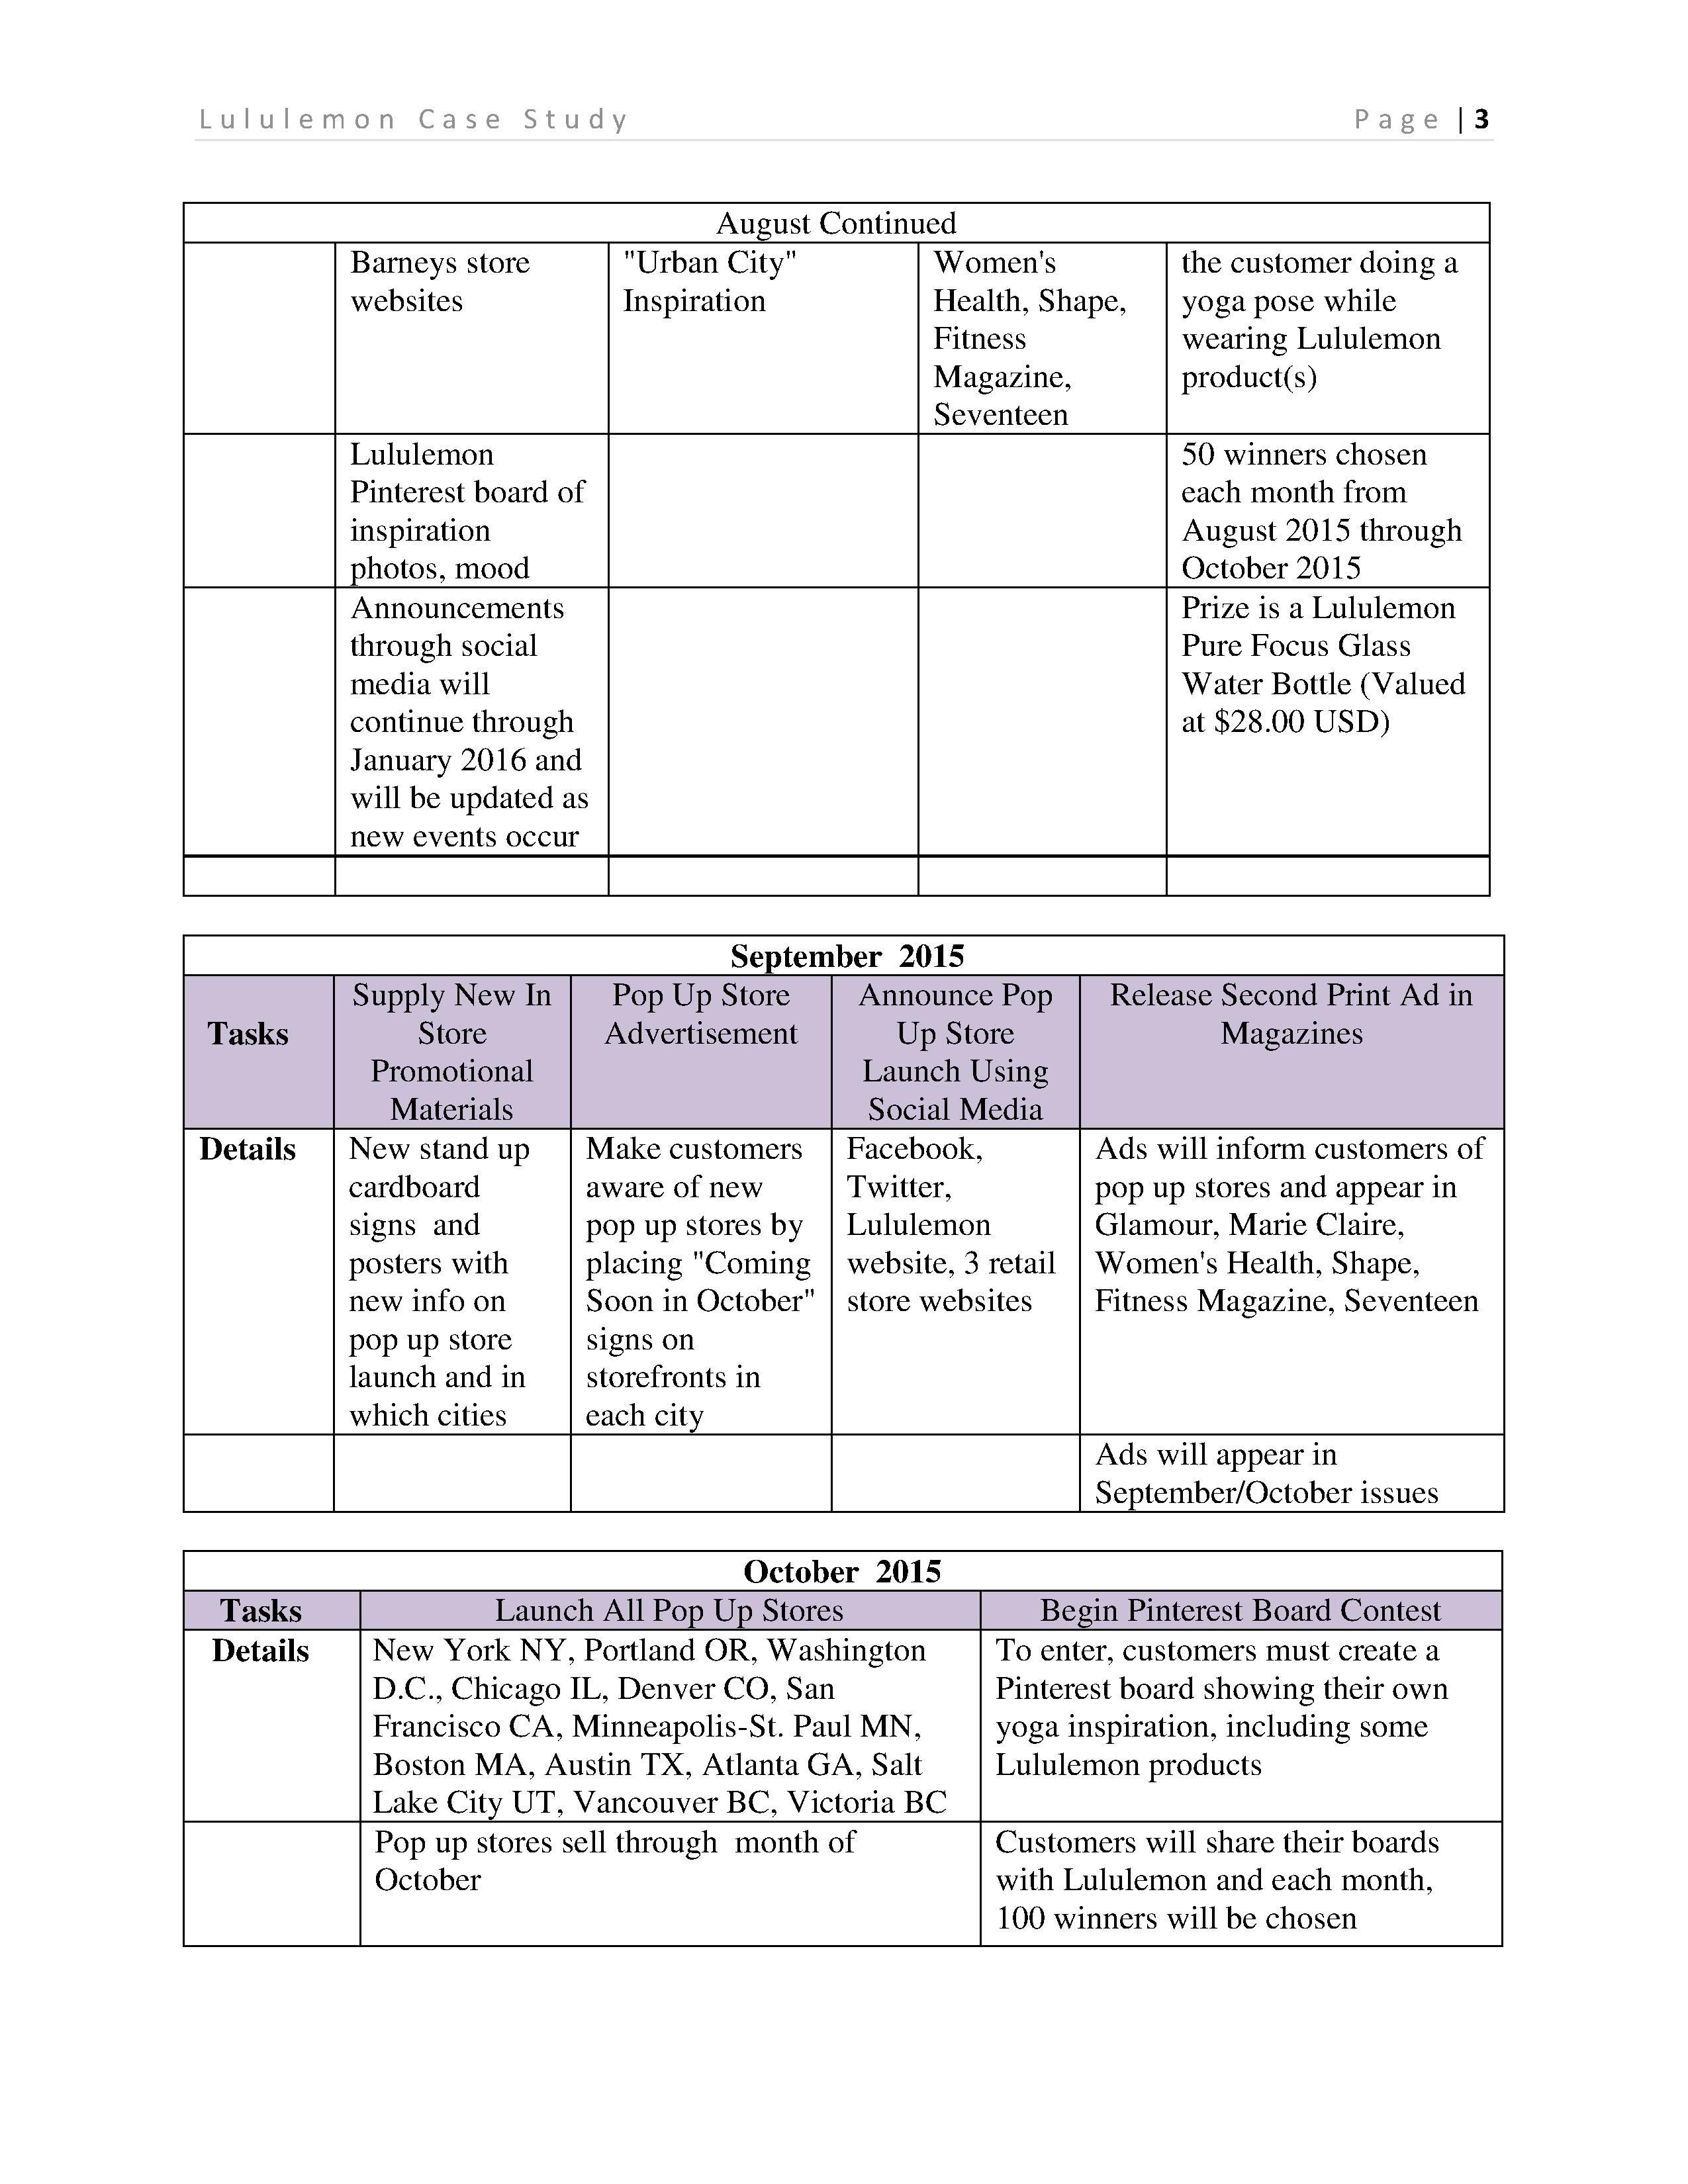 lululemon marketing plan